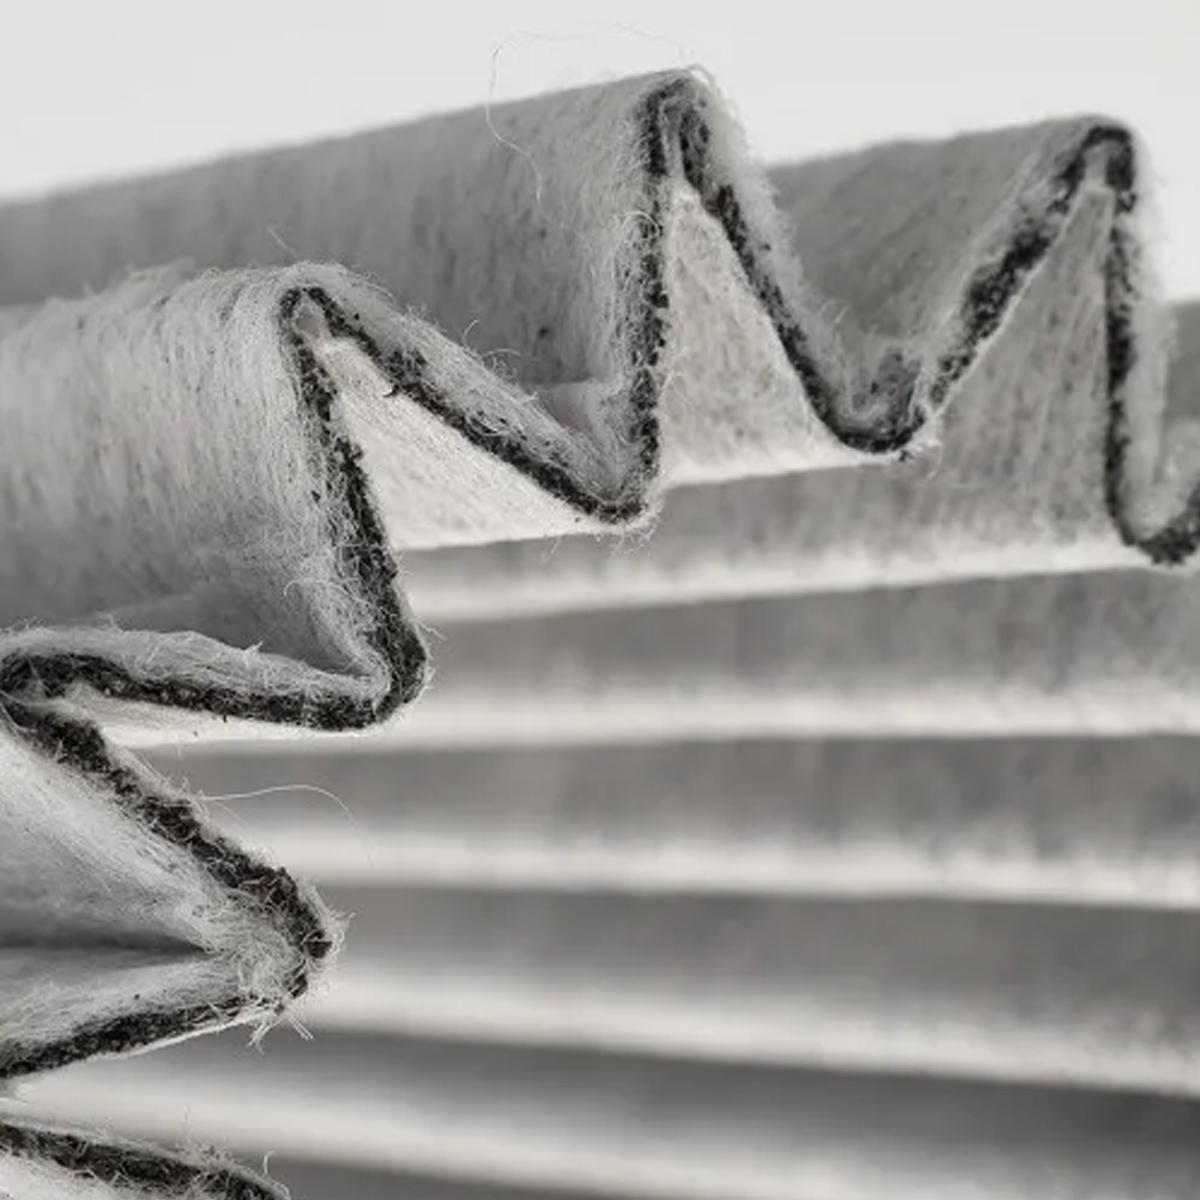 Filtro De Carbono Proactiv 125mm 460m3/h